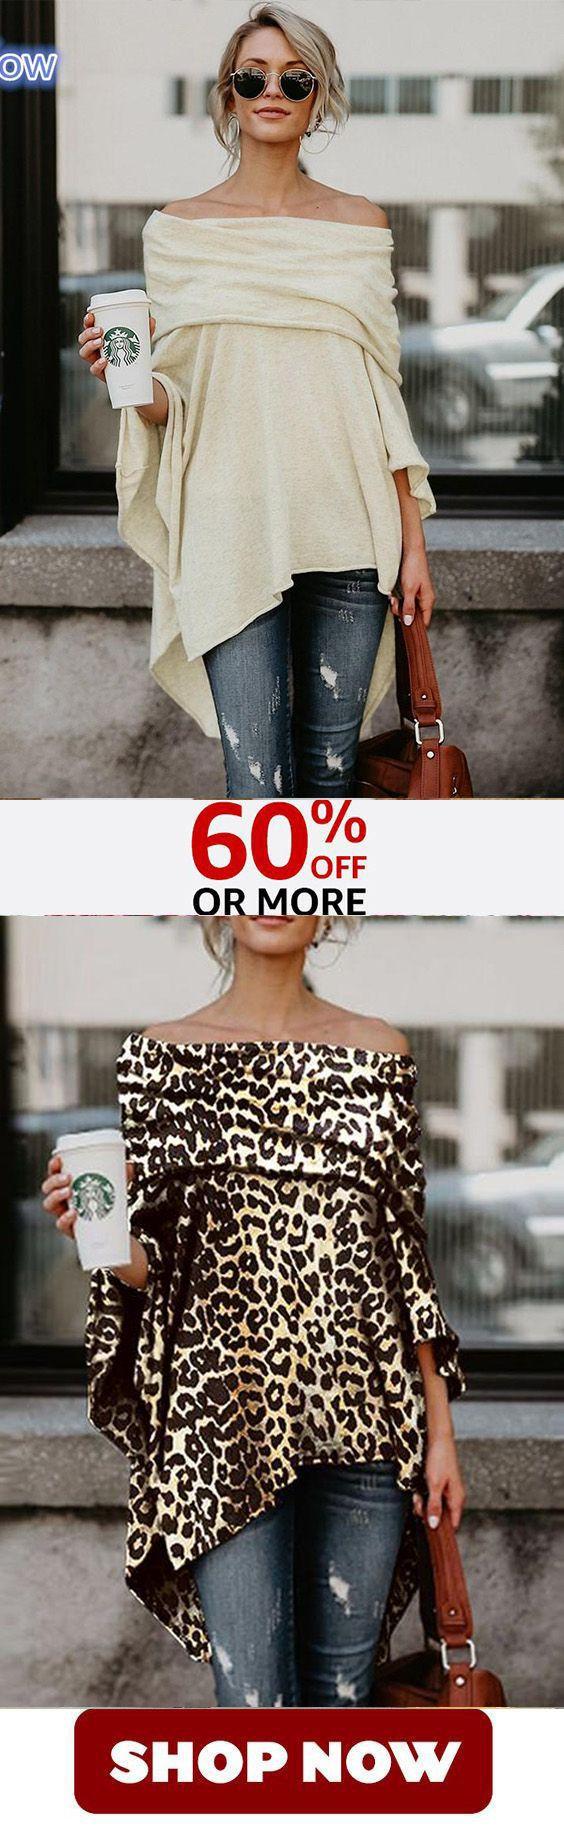 2019 New Fashion Women Shirts,Up to 70% Off!